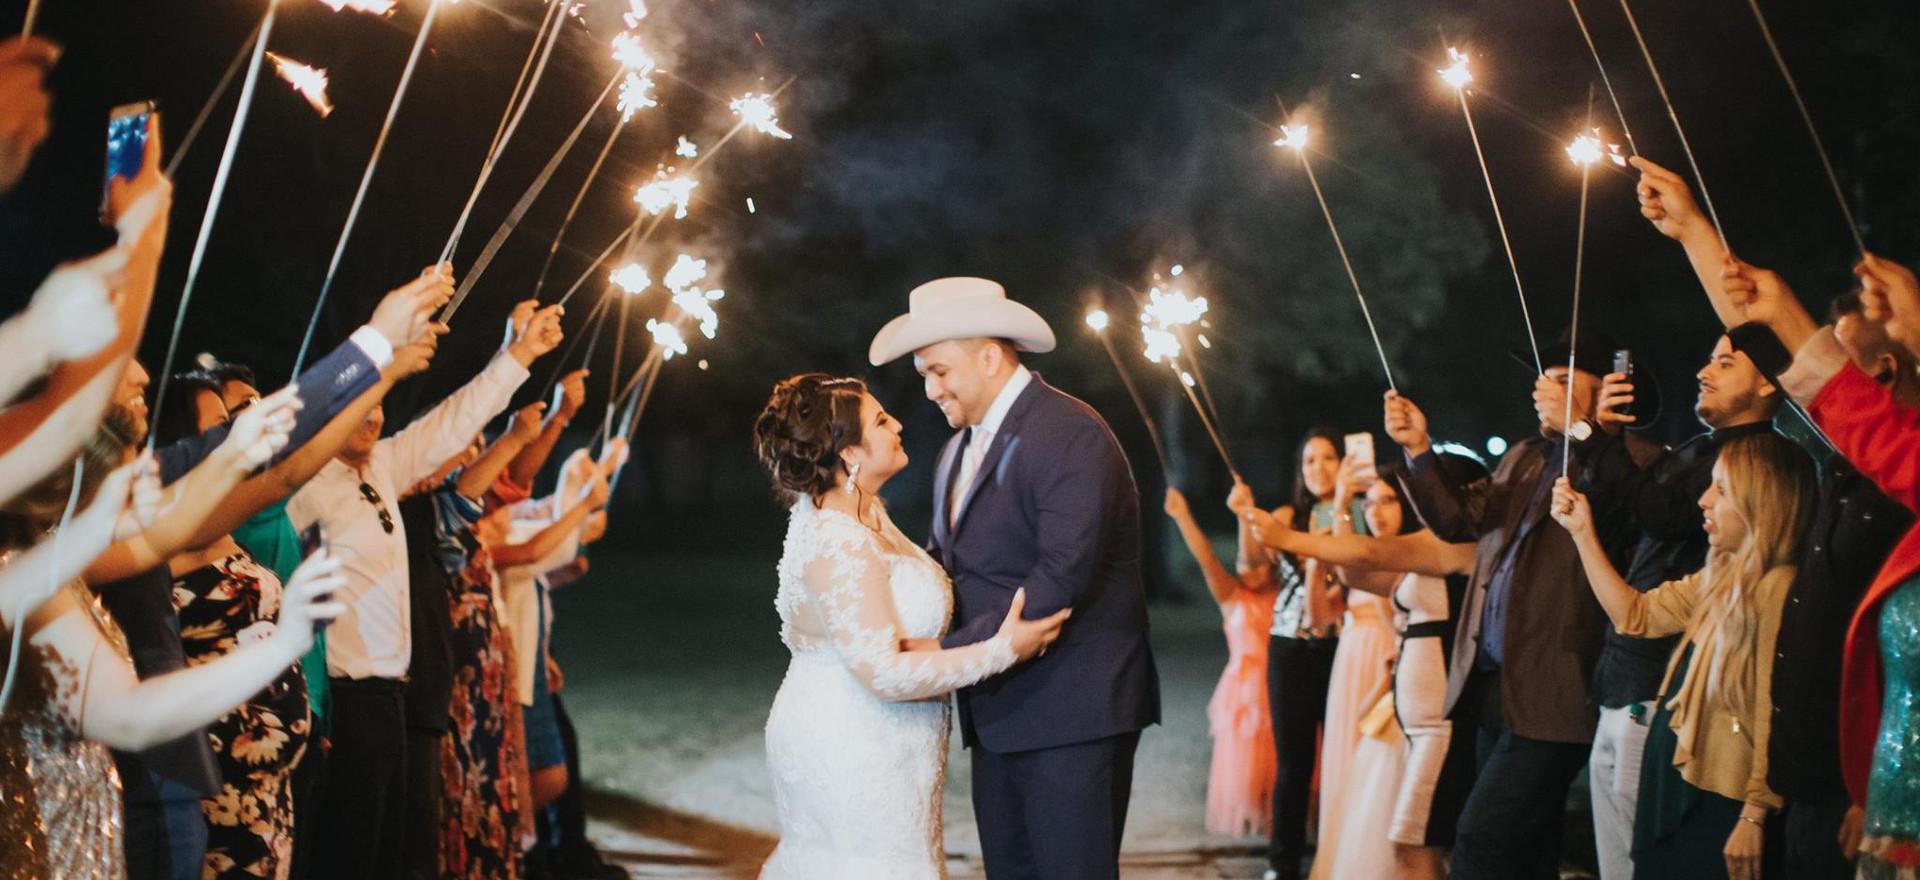 dallas wedding planner serendipity events by tina wedding coordination bride